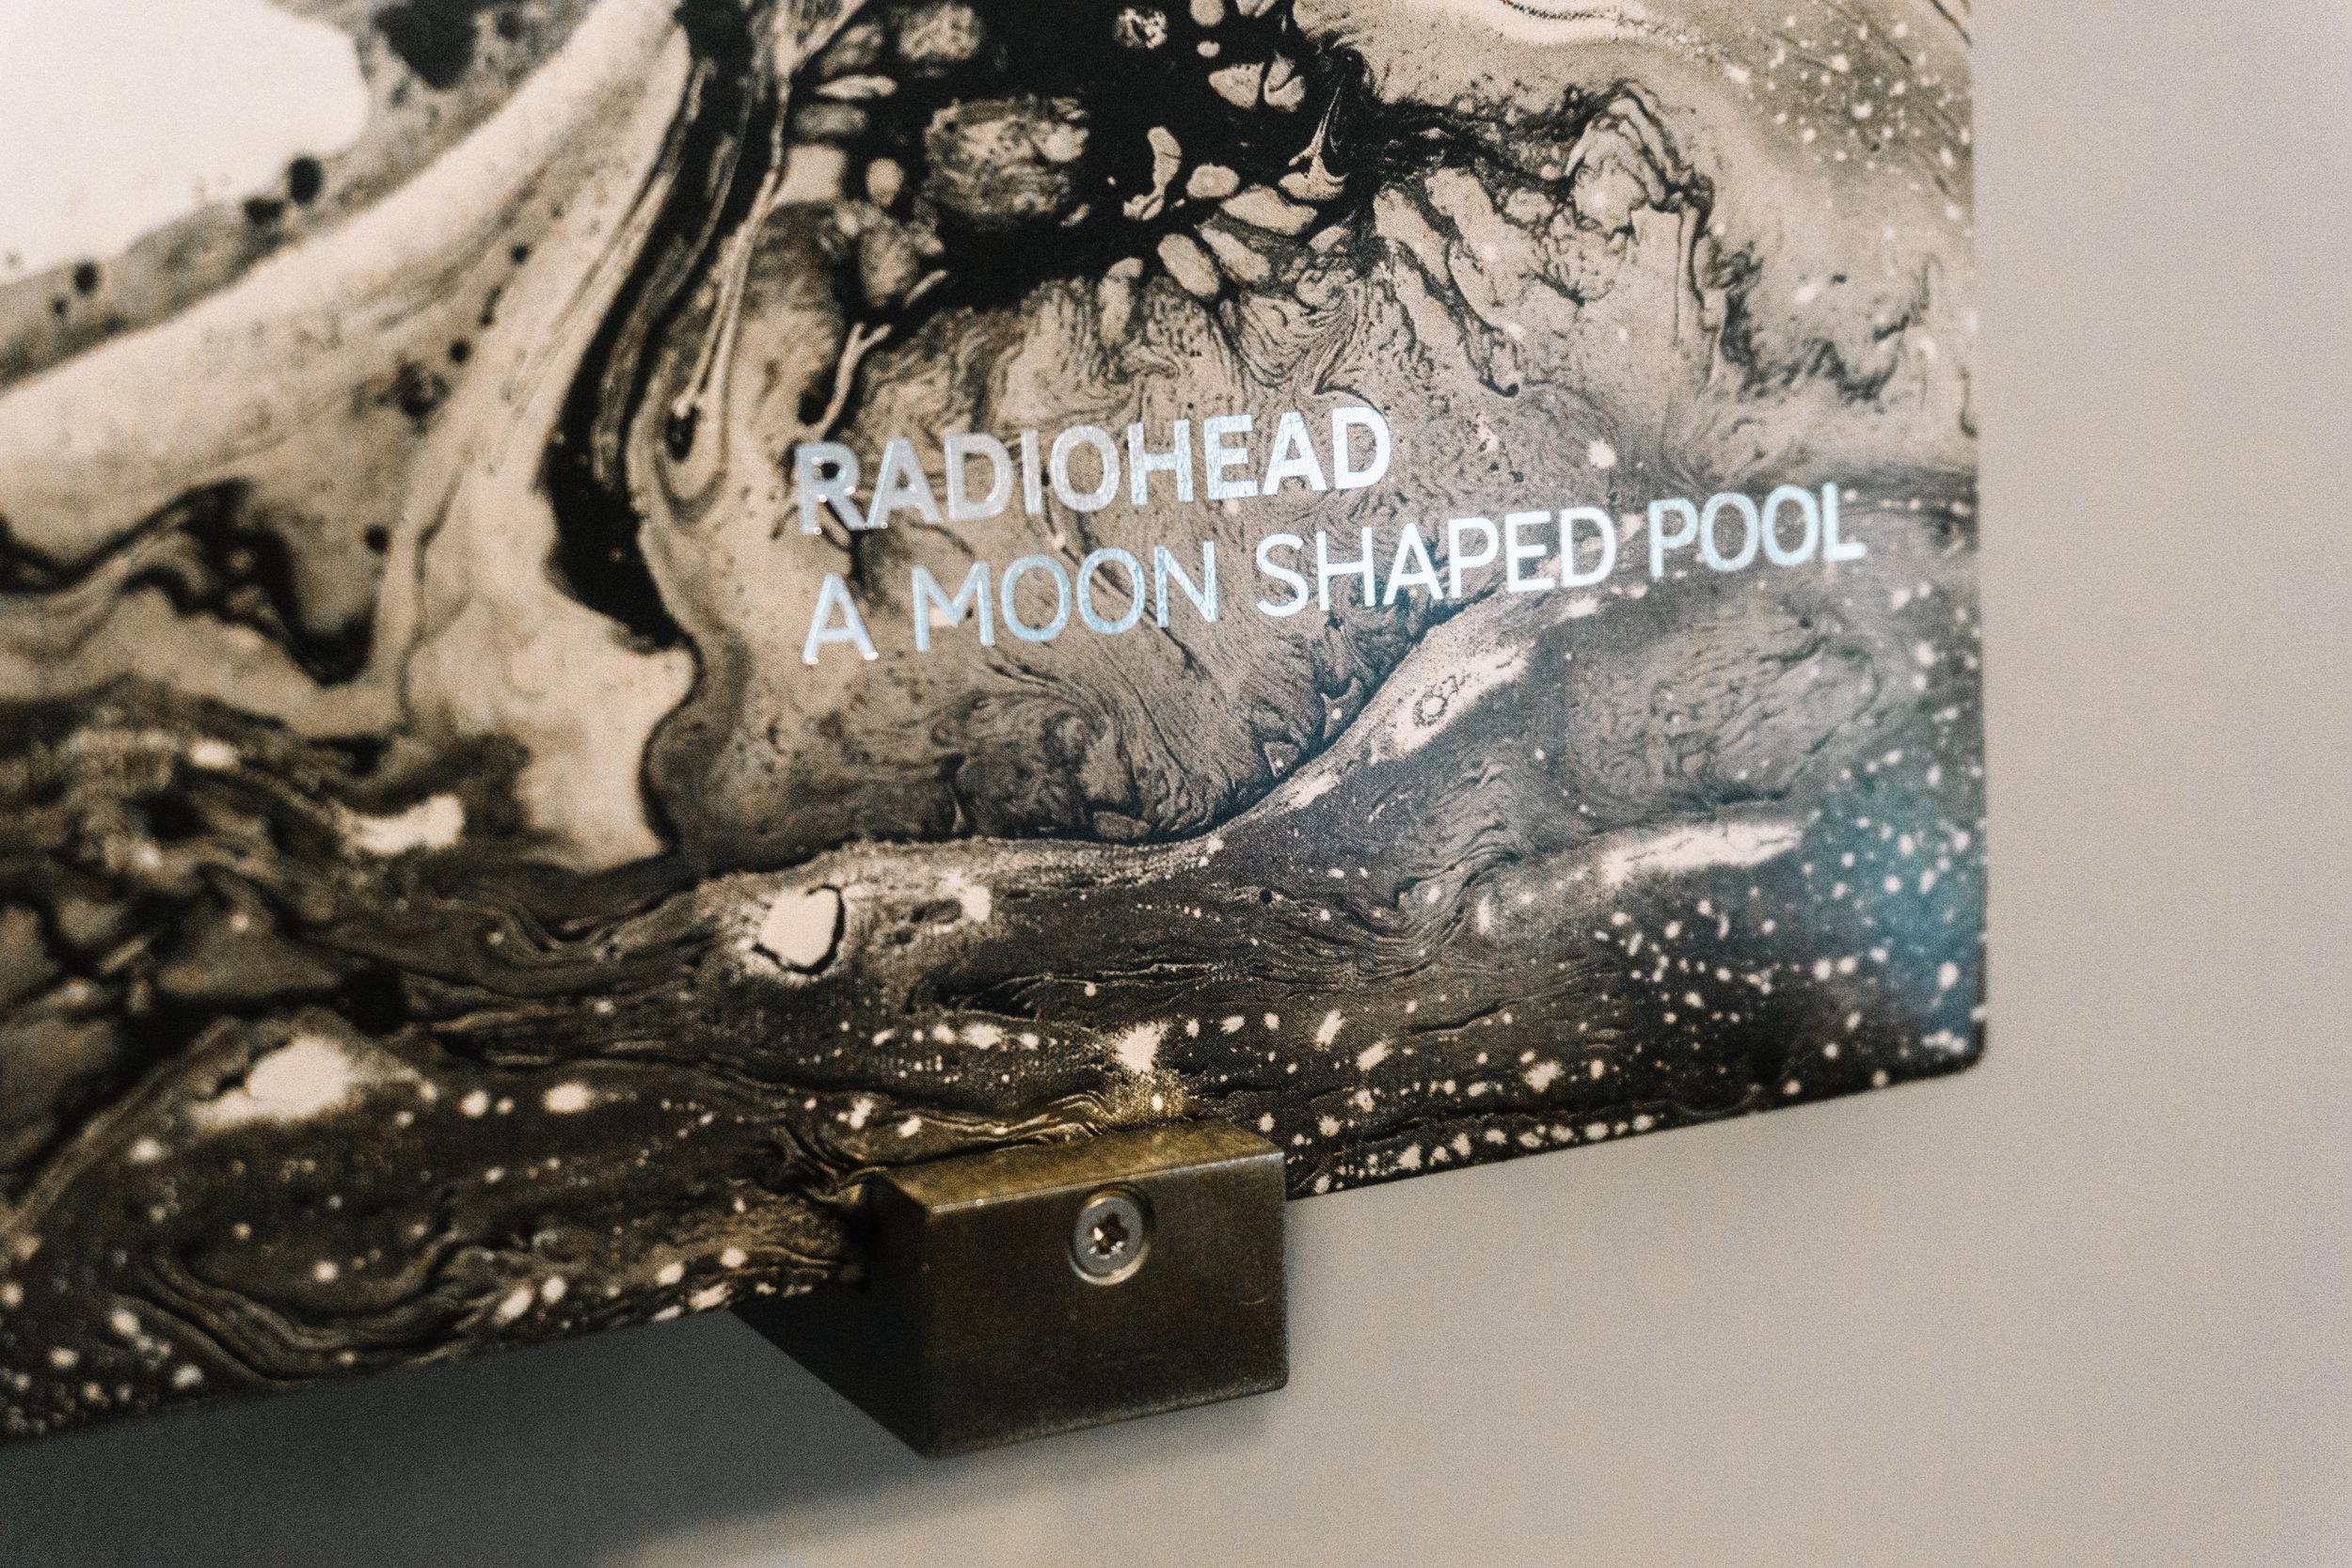 Radiohead A Moon Shaped Pool Album cover foil